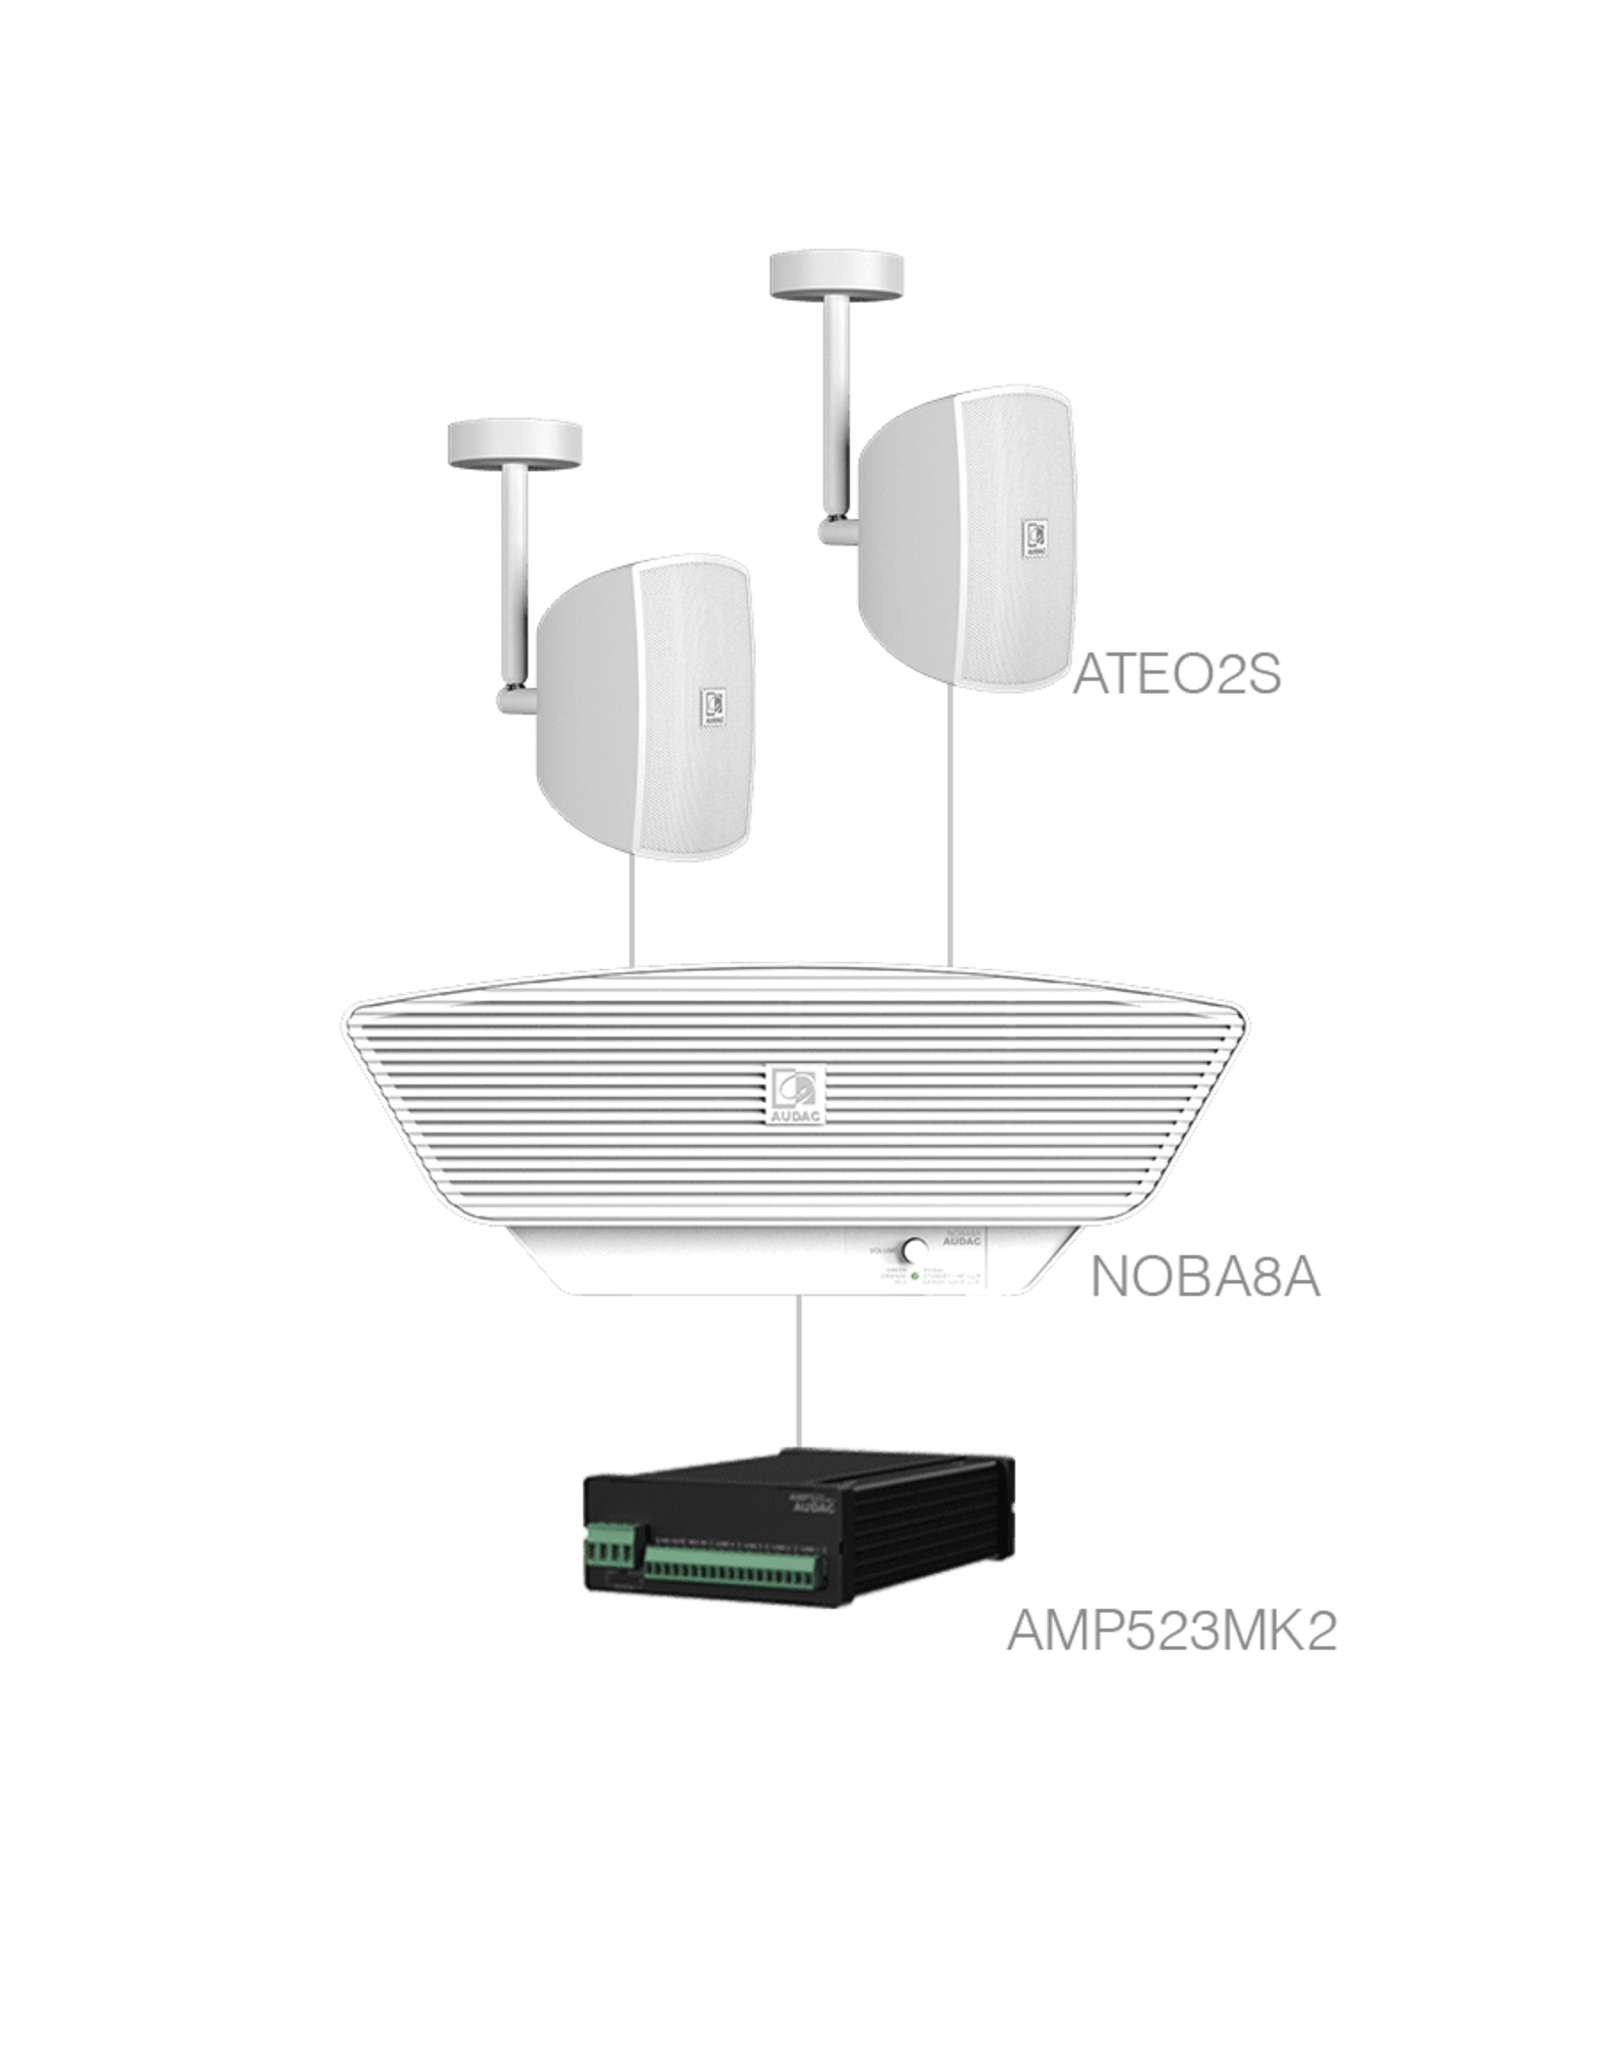 Audac 2x ATEO2S + NOBA8A + AMP523MK2 White